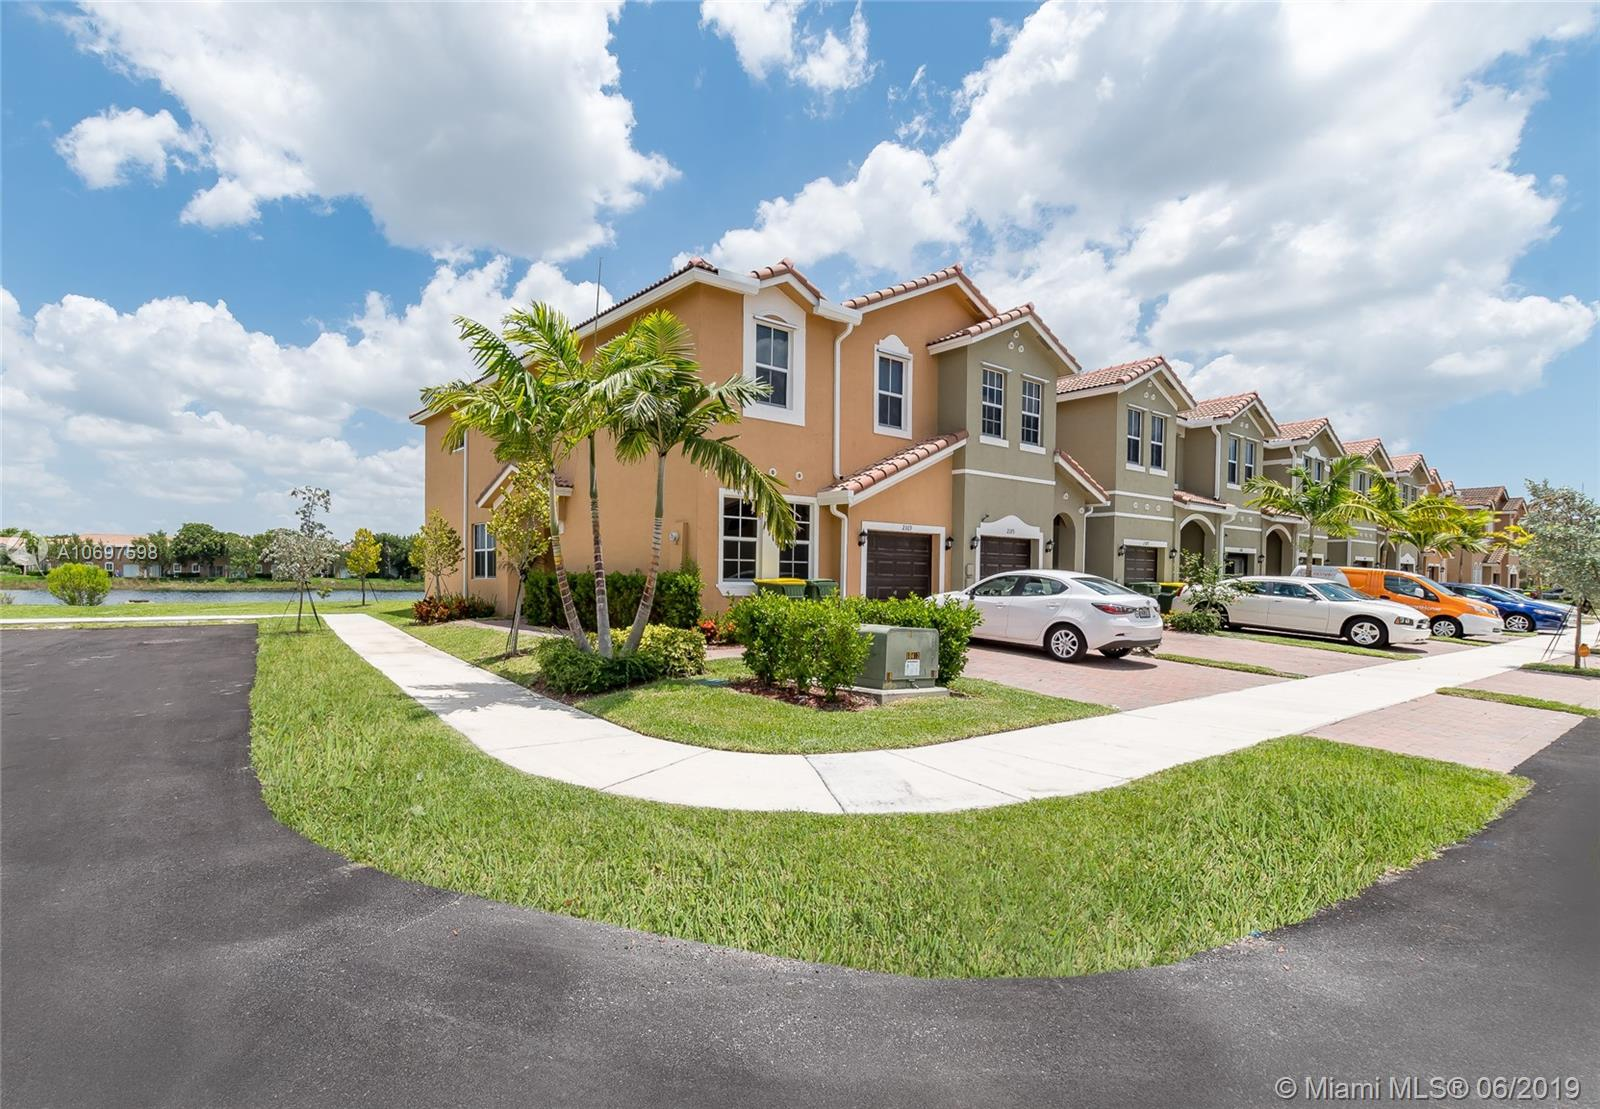 2373 SE 14th St #2373, Homestead, FL 33035 - Homestead, FL real estate listing